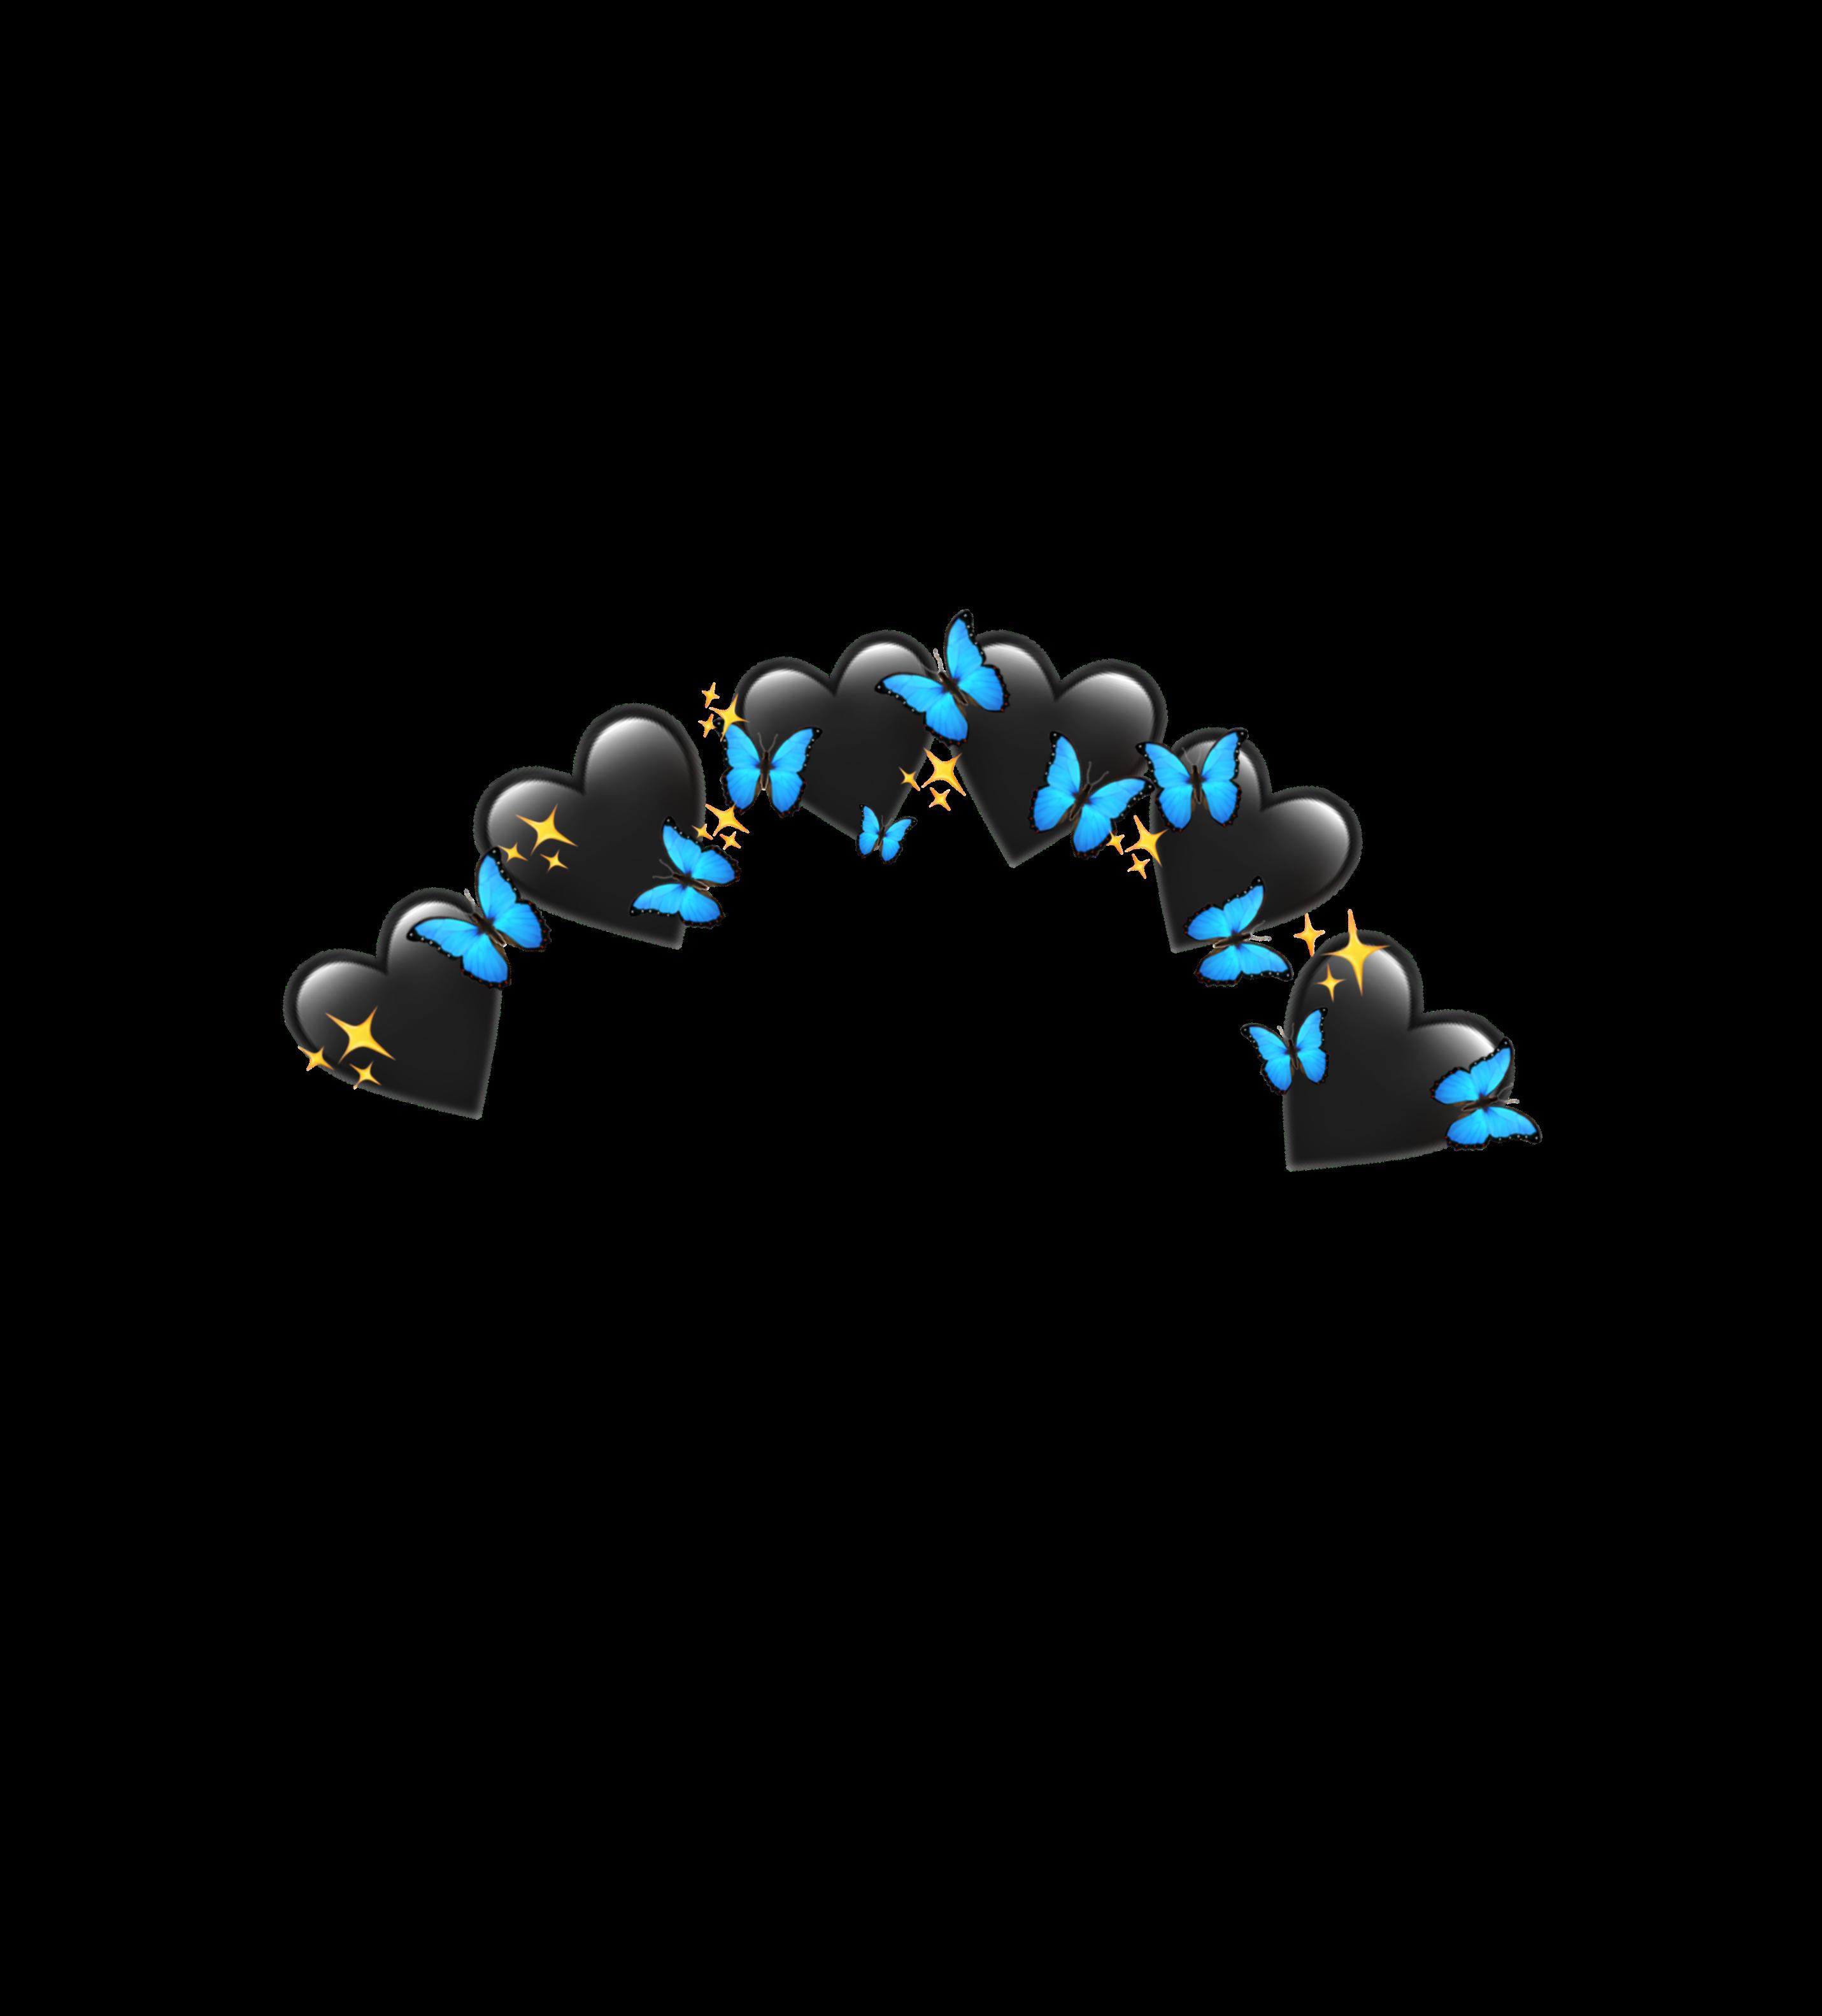 Butterfly Effect Crown Black Blue Crown Flower Emojis Emoji Butterfly Spark Sparkle Blue Music Flow In 2020 Emoji Stickers Image Stickers Butterfly Effect